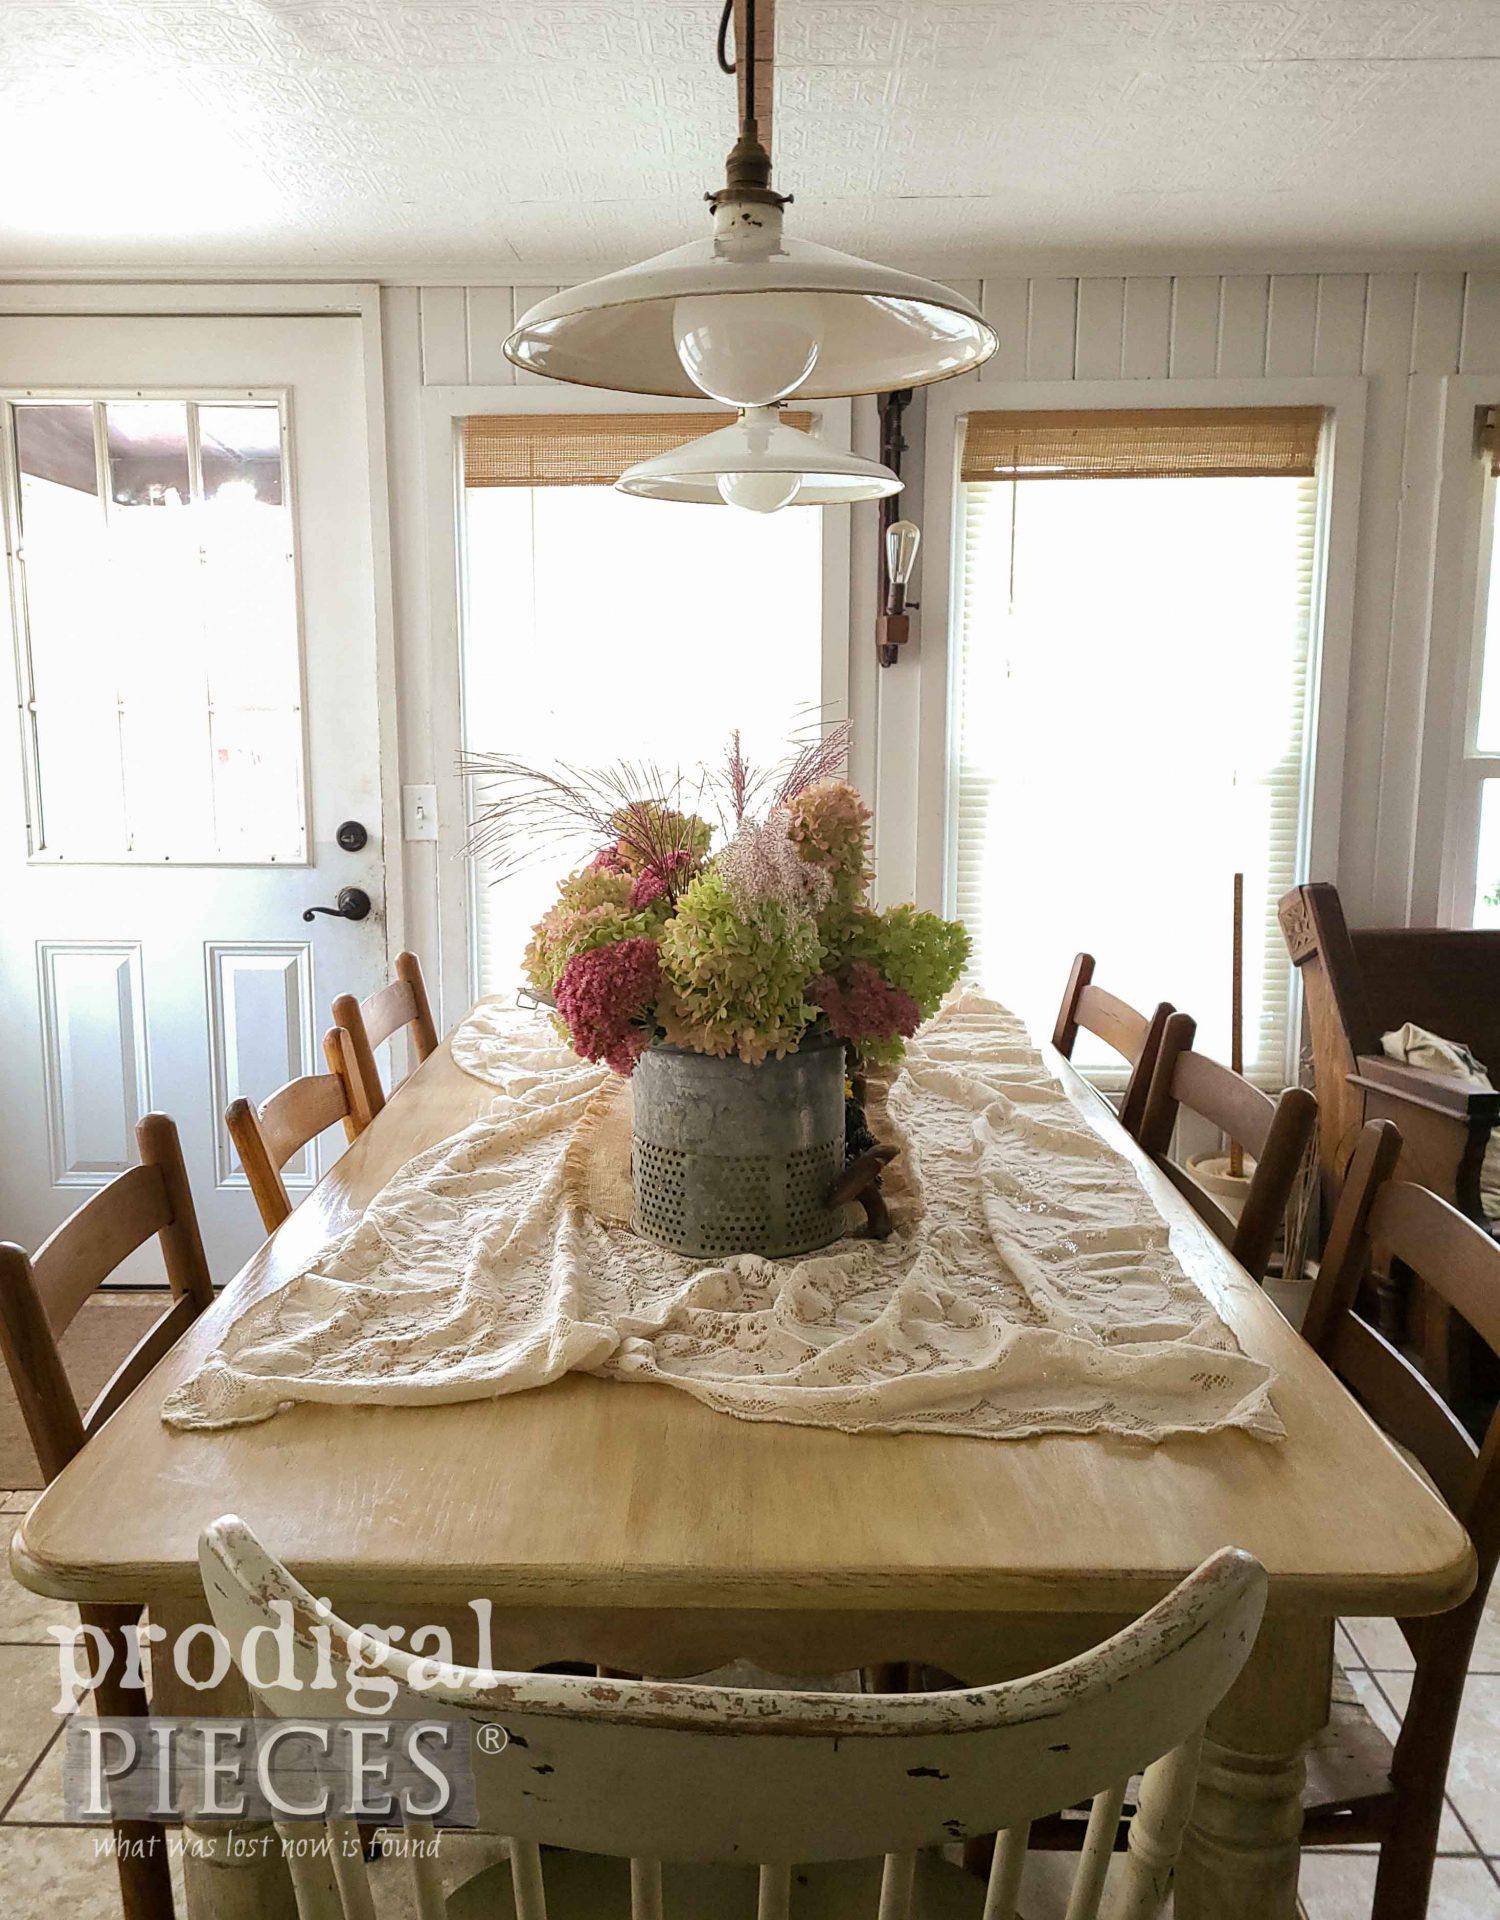 Simple Farmhouse Dining Tablescape by Larissa of Prodigal Pieces | prodigalpieces.com #prodigalpieces #farmhouse #fall #home #homedecor